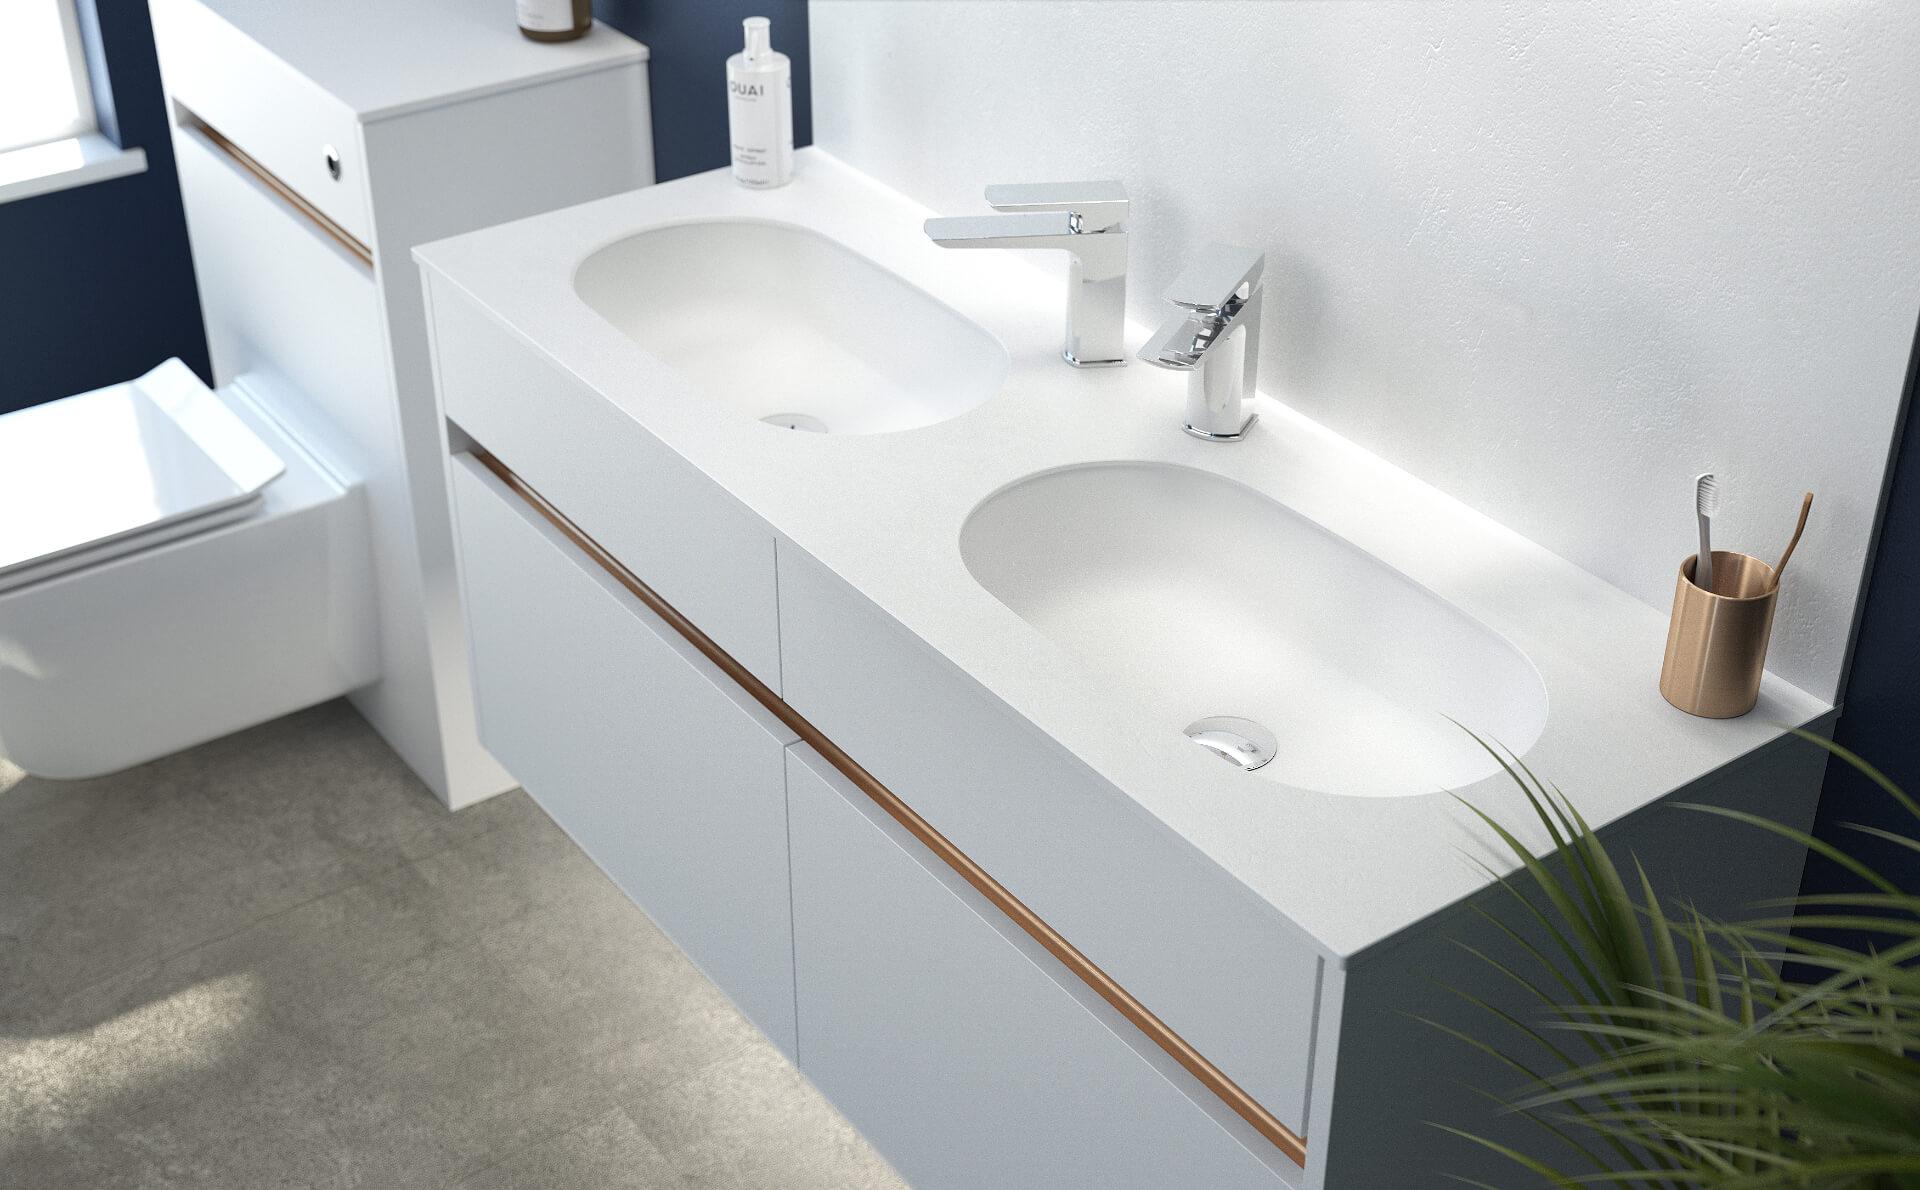 Utopia Bathroom Contemporary Fitted Bathroom Sink Unit